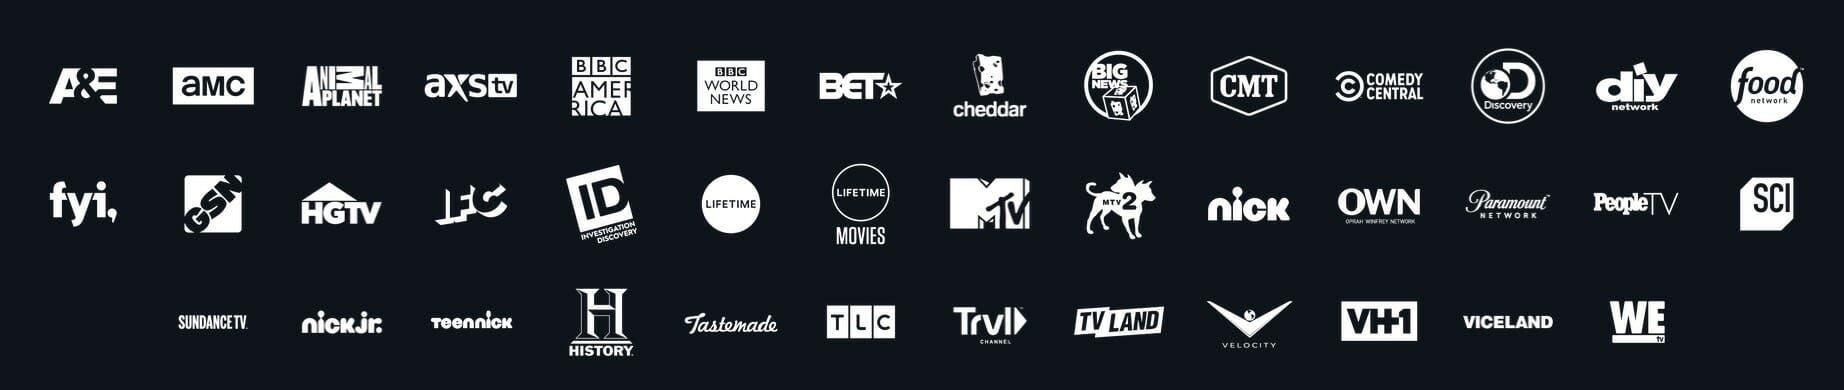 sling tv competitors philo channels